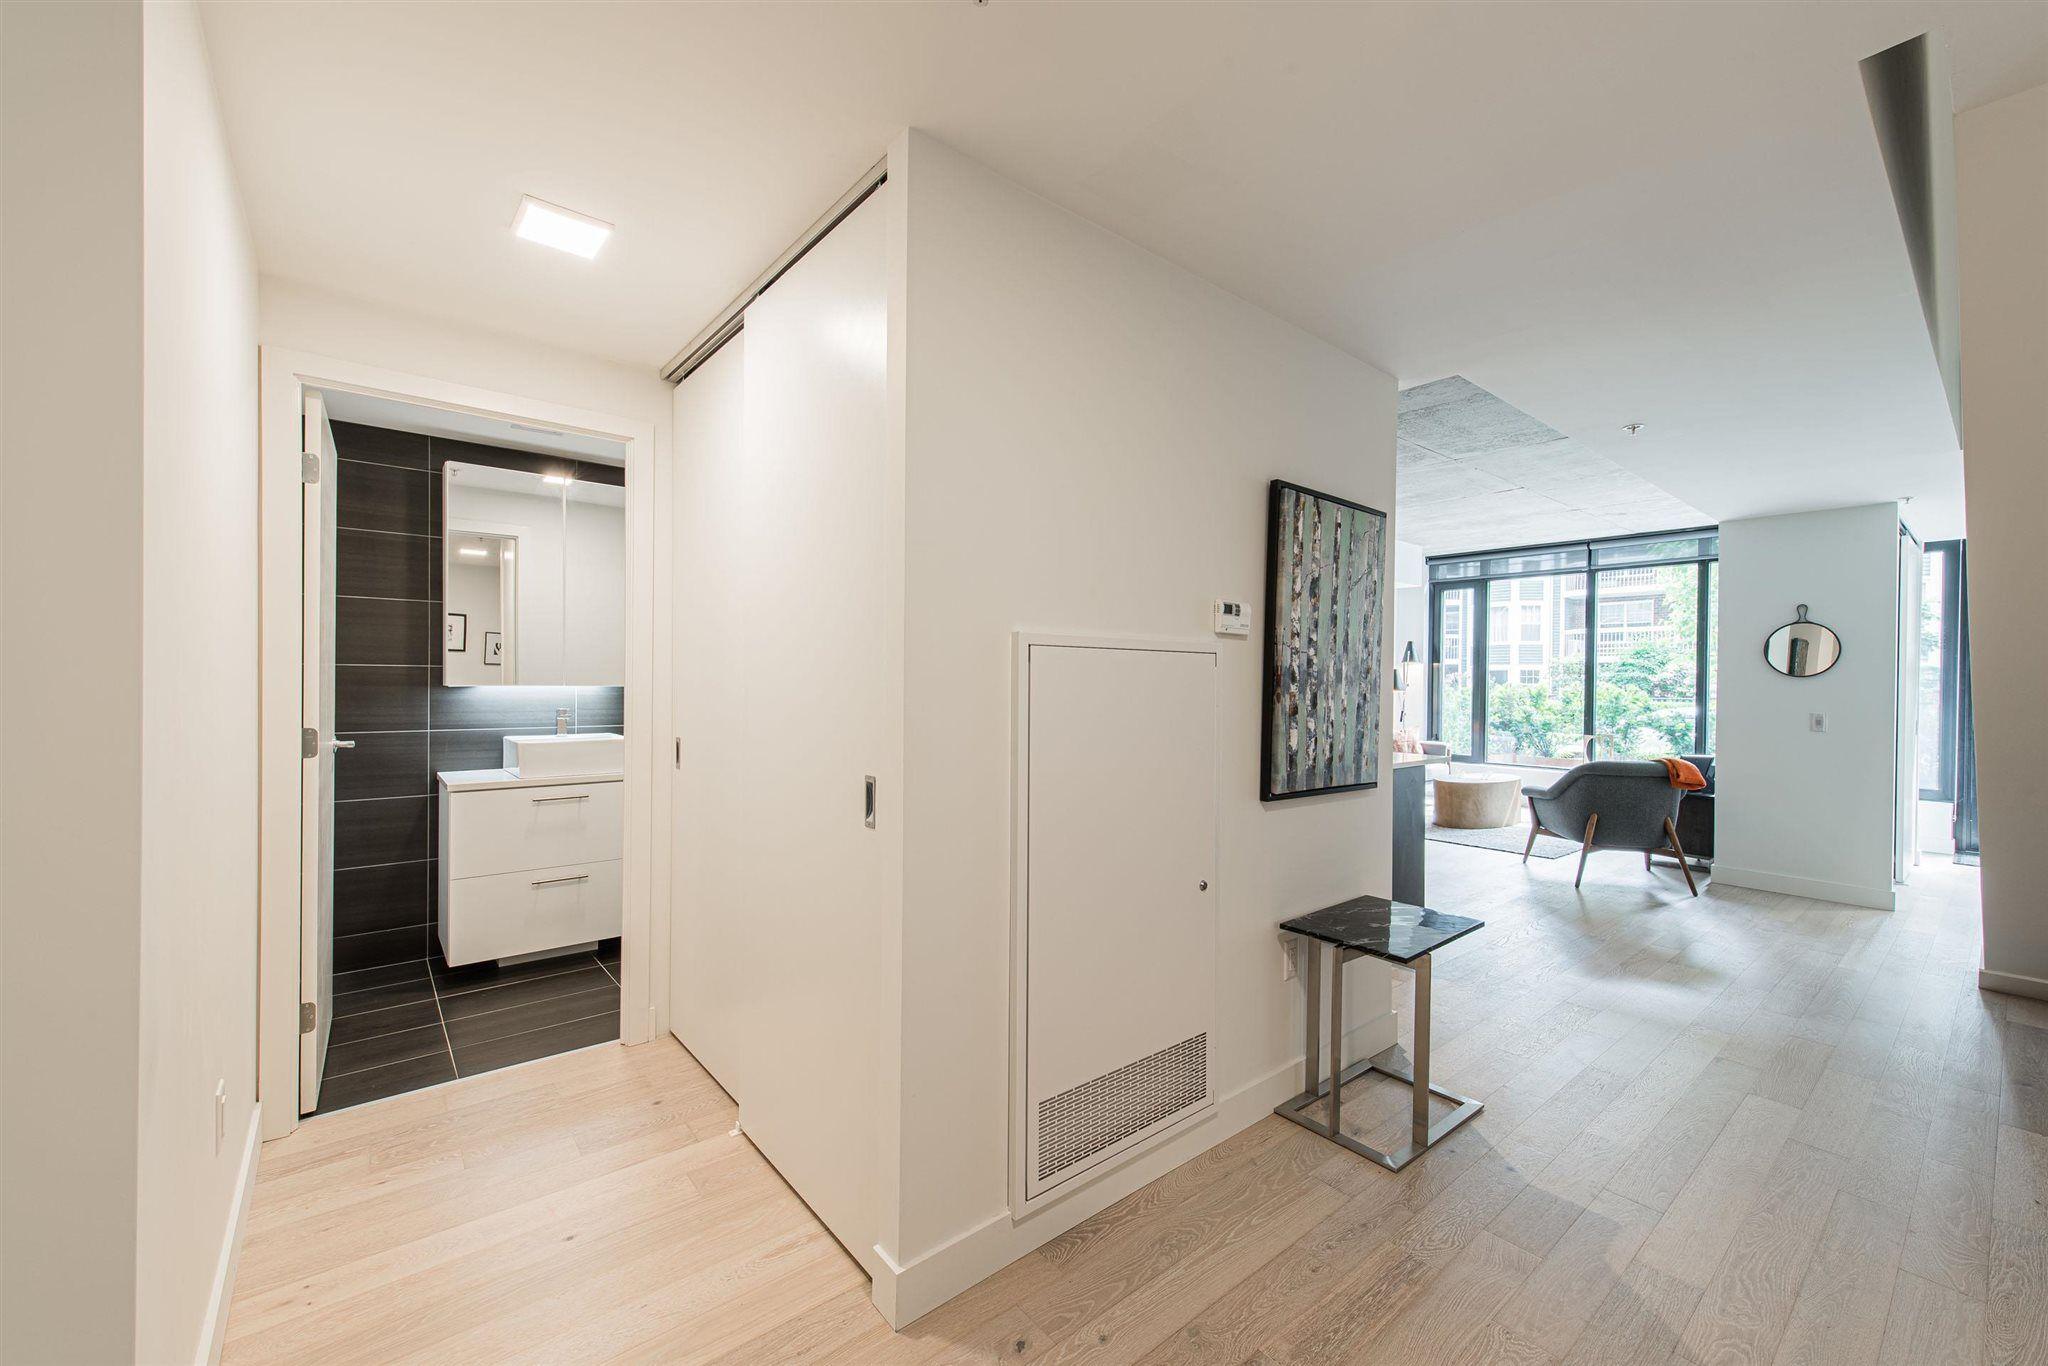 Photo 16: Photos: 105 1048 Wellington Street in Halifax: 2-Halifax South Residential for sale (Halifax-Dartmouth)  : MLS®# 202100816